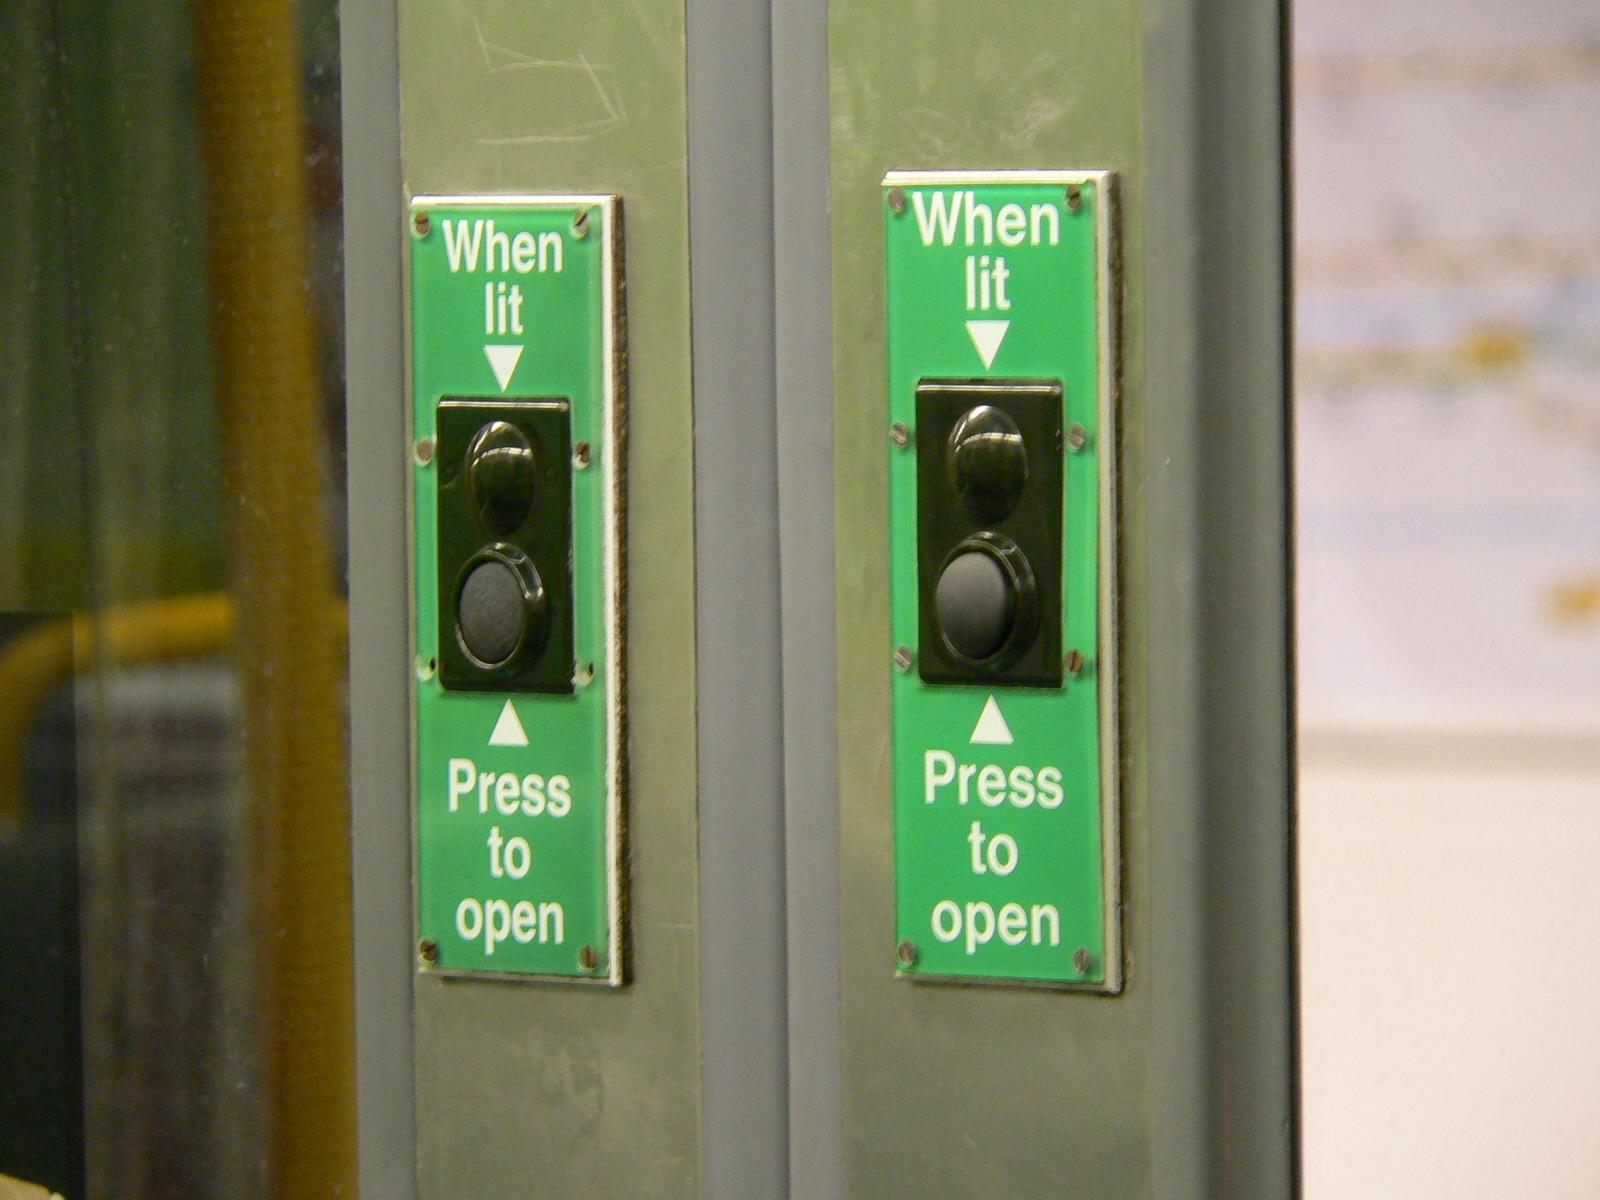 File:Tyne and Wear Metro - old-style door buttons.jpg & File:Tyne and Wear Metro - old-style door buttons.jpg - Wikimedia ... Pezcame.Com